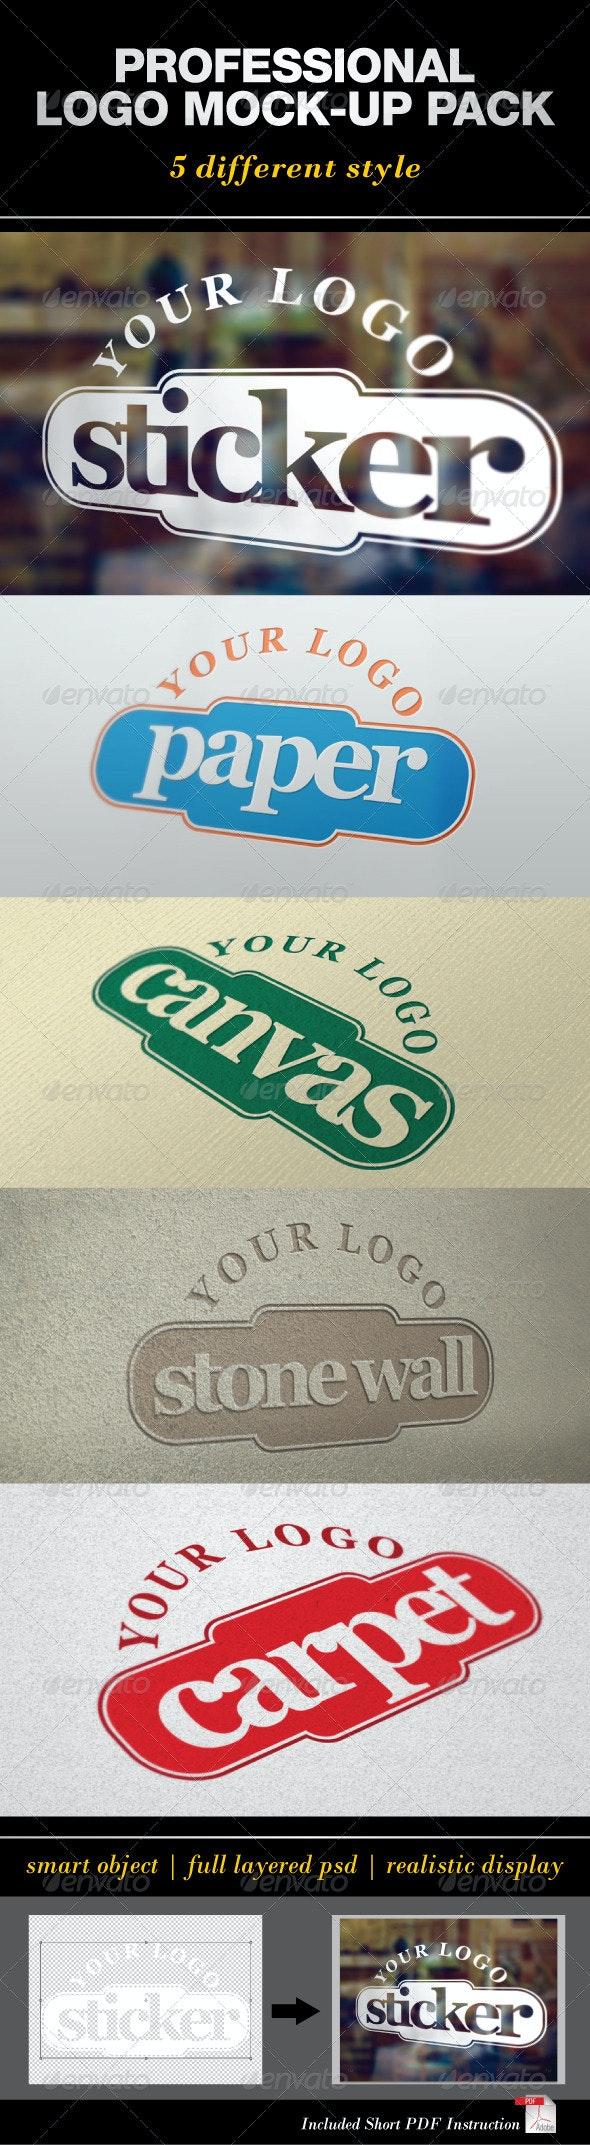 Professional Logo Mock-Up Pack - Logo Product Mock-Ups